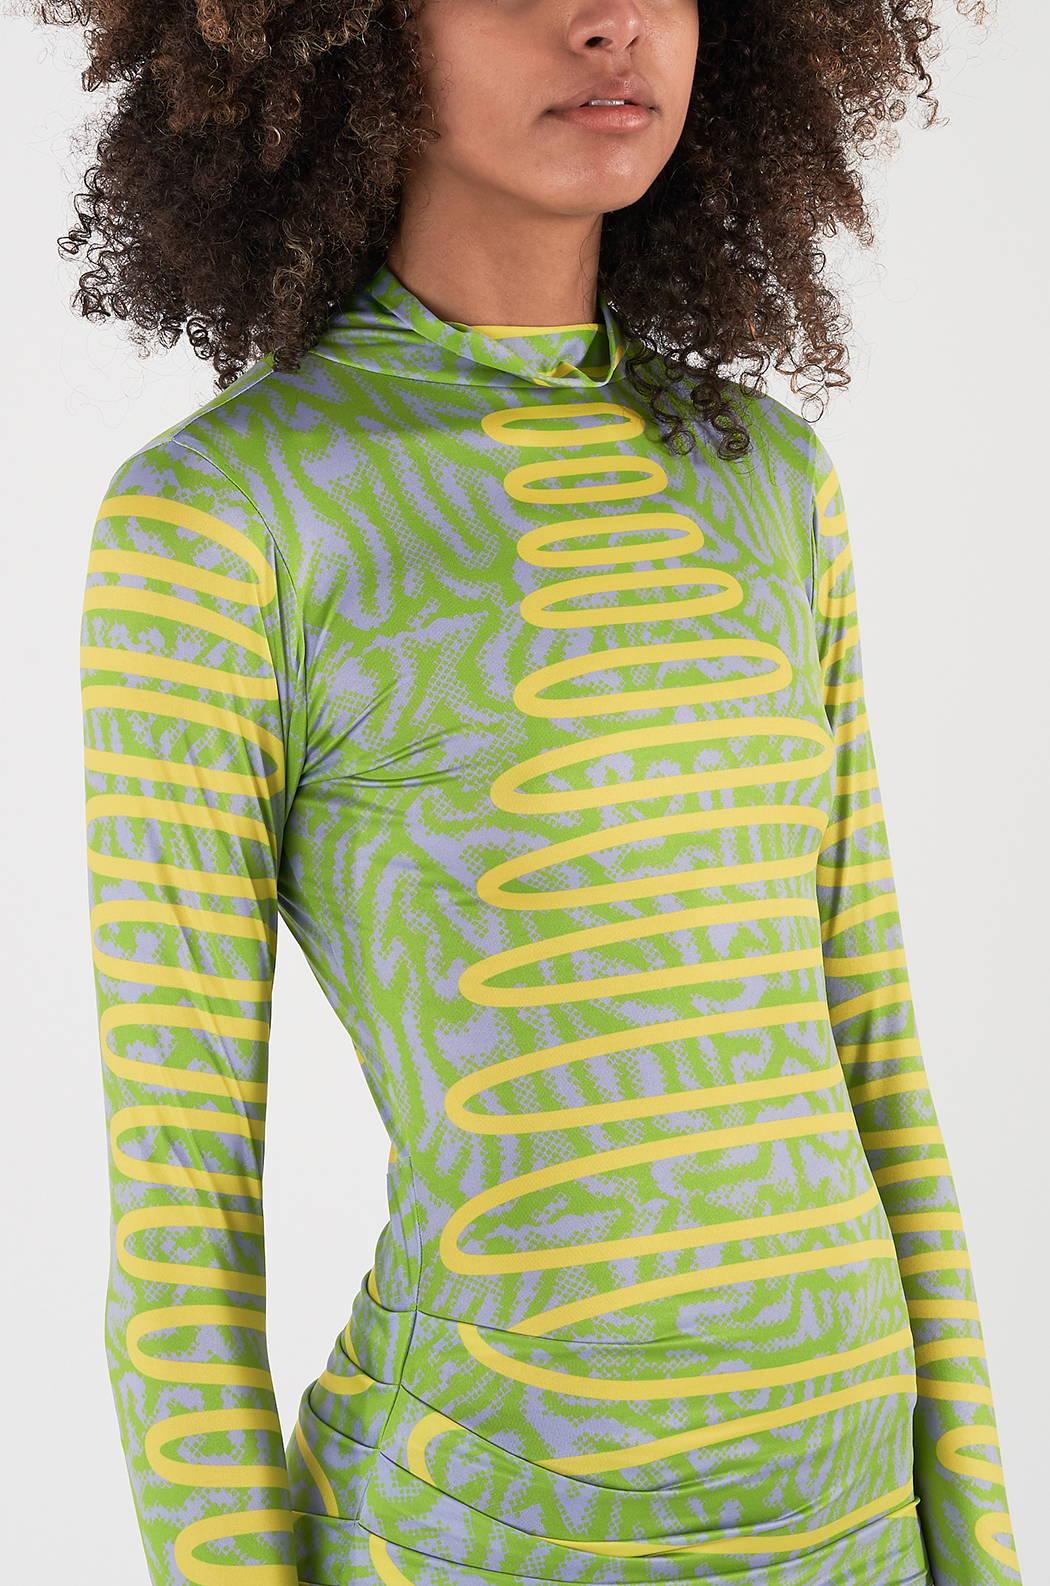 Shop the Maisie Wilen Turtleneck Dress